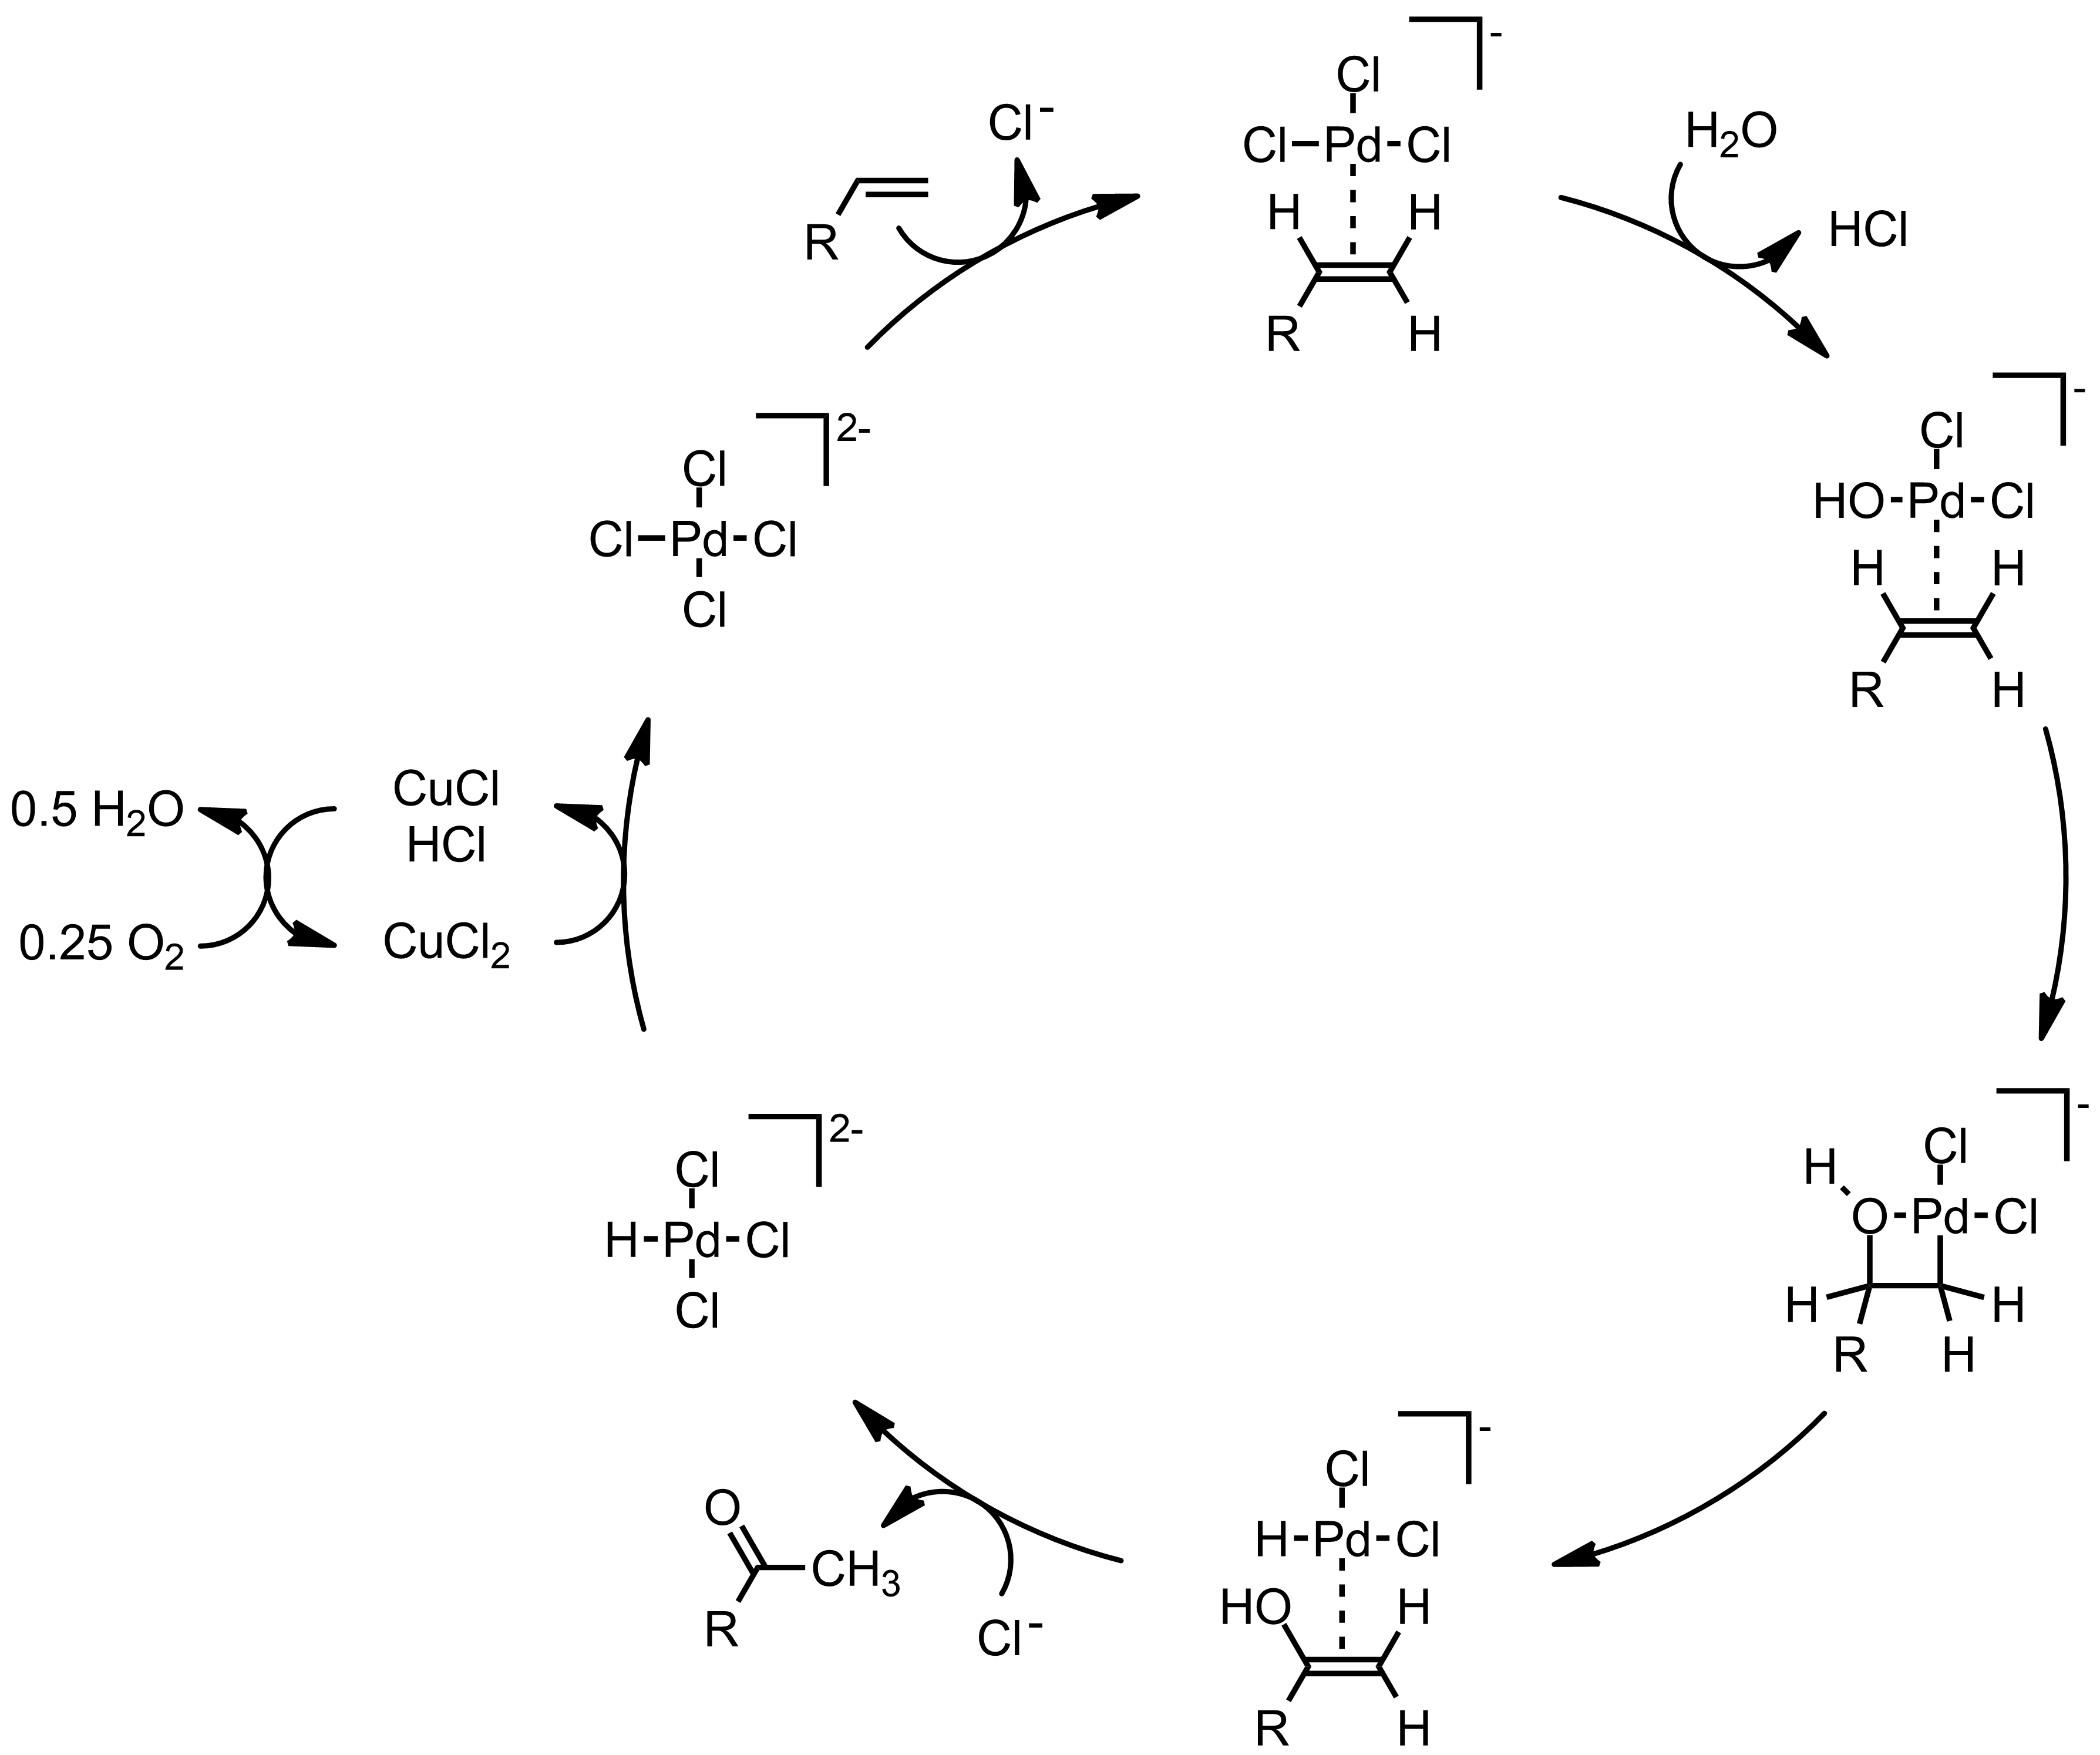 Mechanism of the Wacker Oxidation